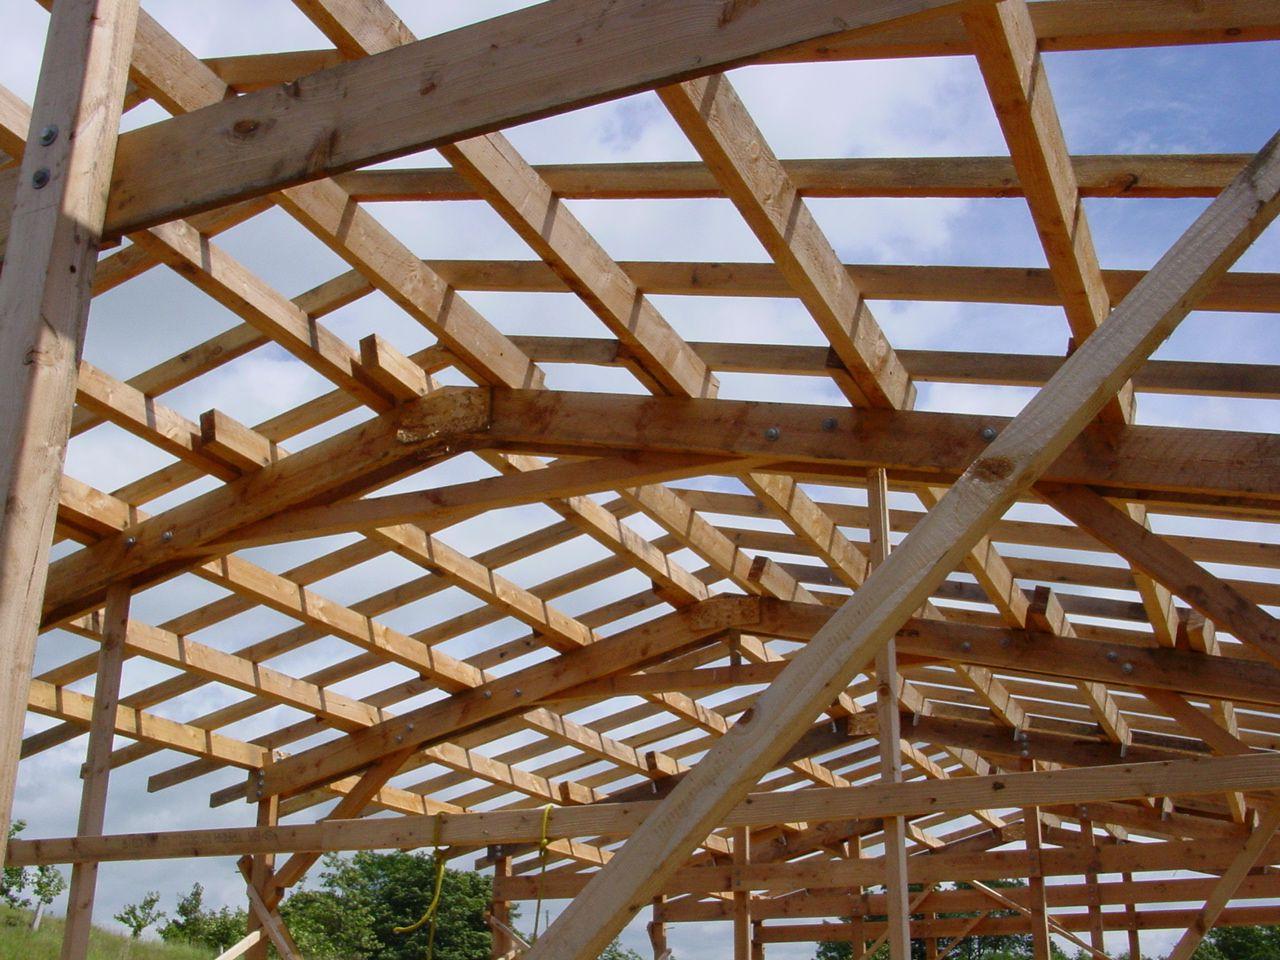 Roofing frames